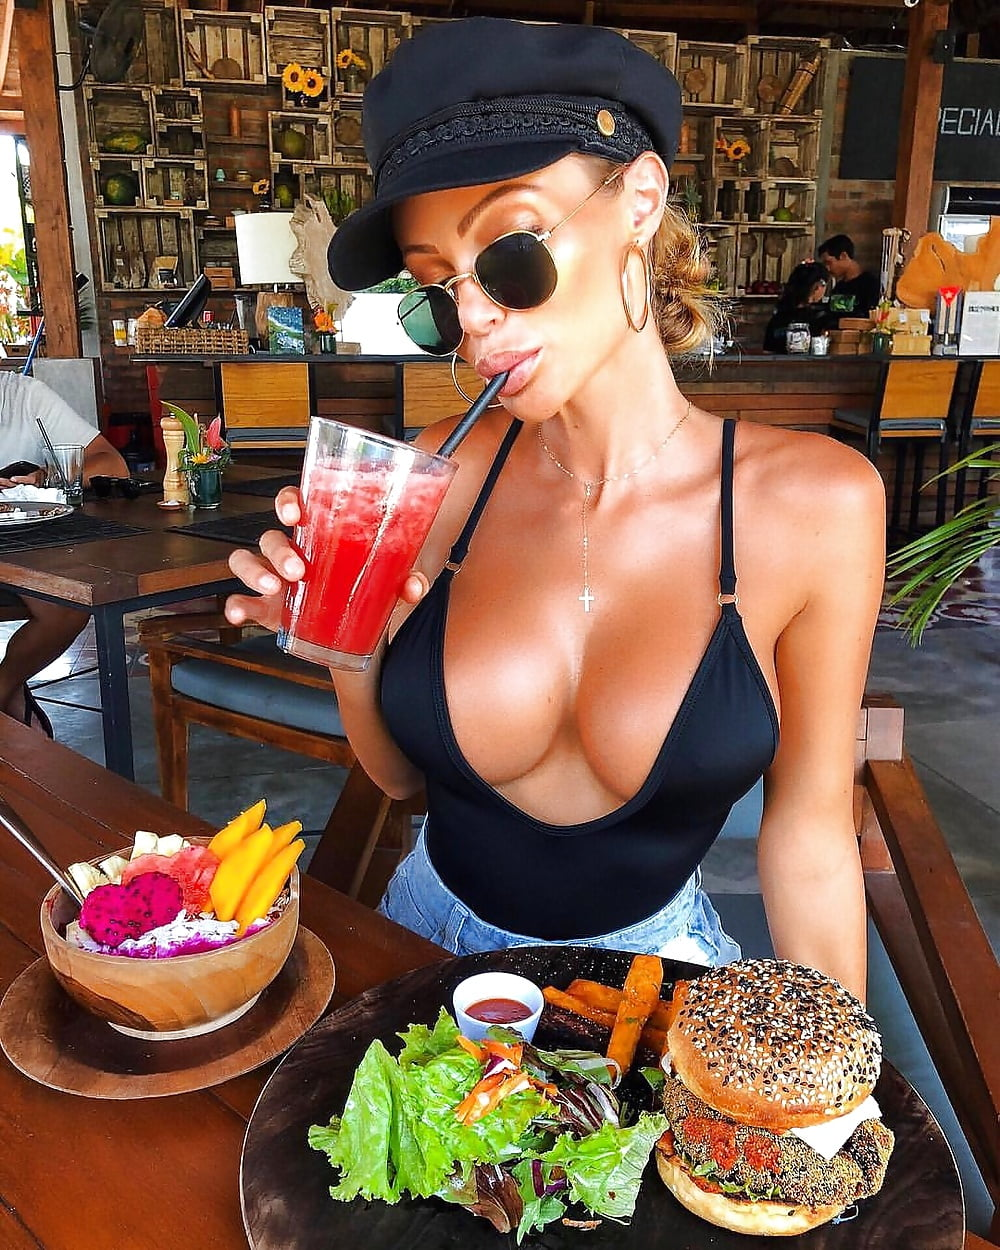 Ricky hatton's breakfast snap stuns fans as huge pair of breasts take spotlight